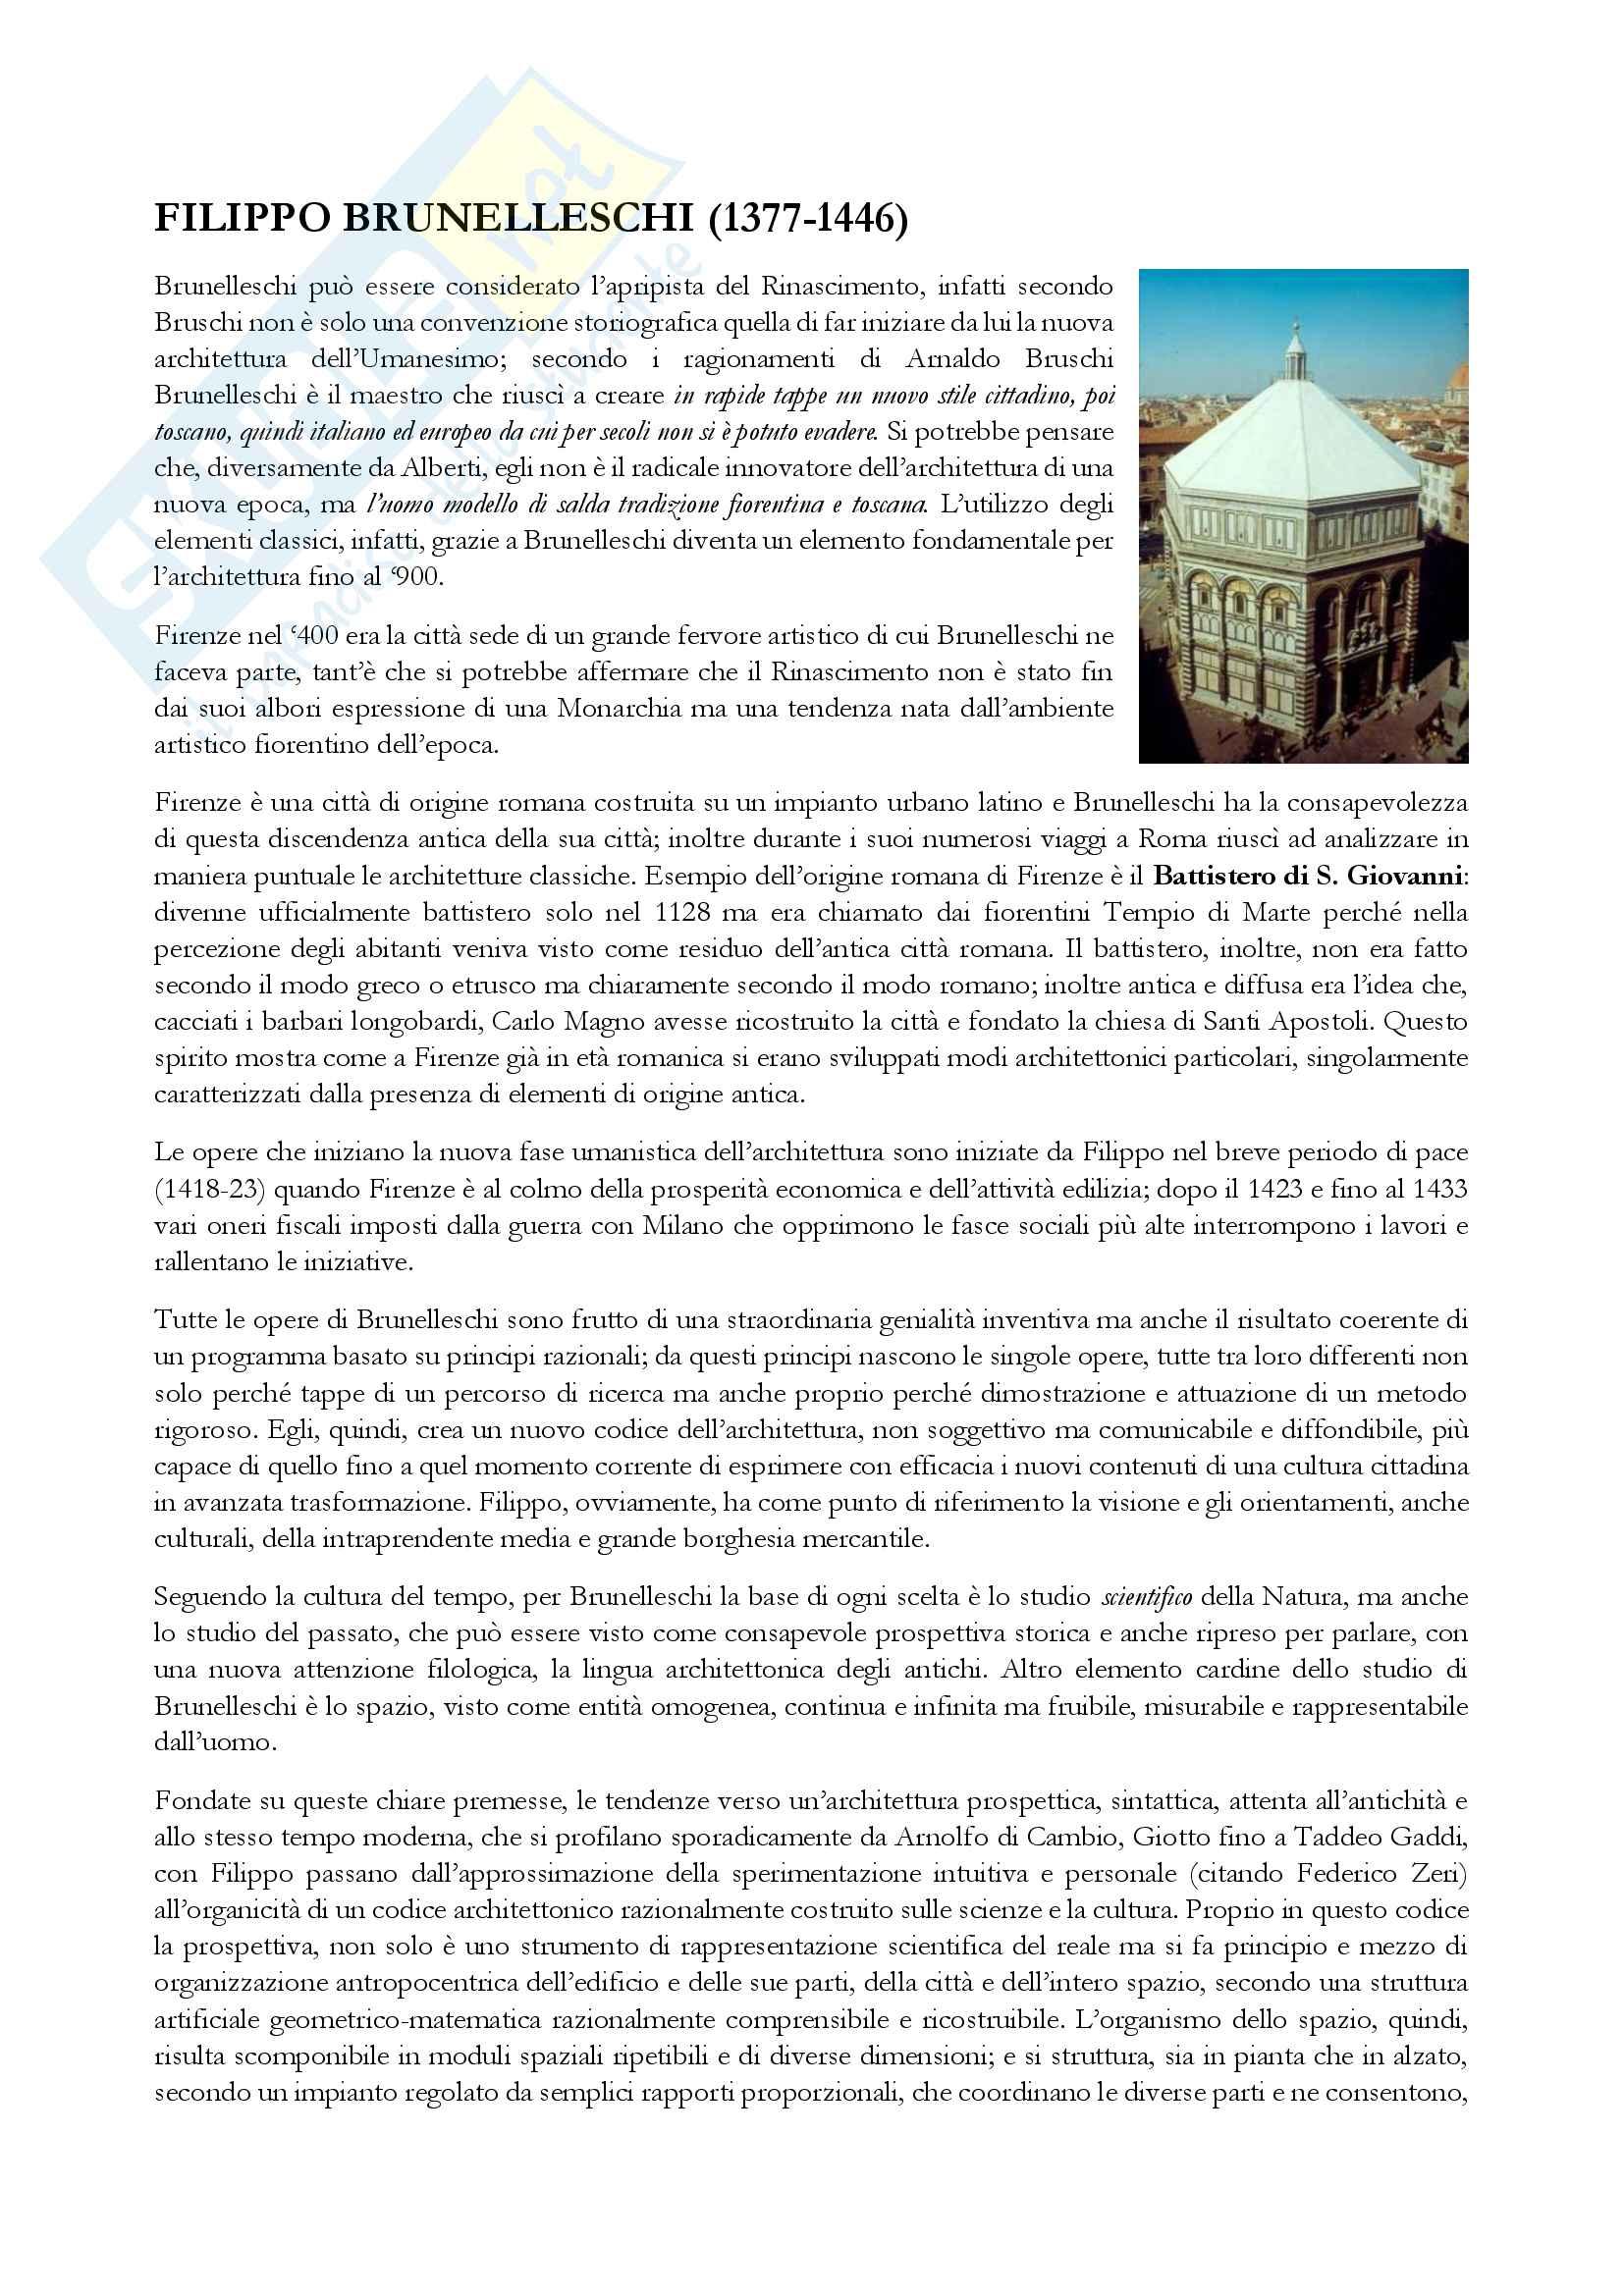 Appunti storia architettura moderna, Cornaglia